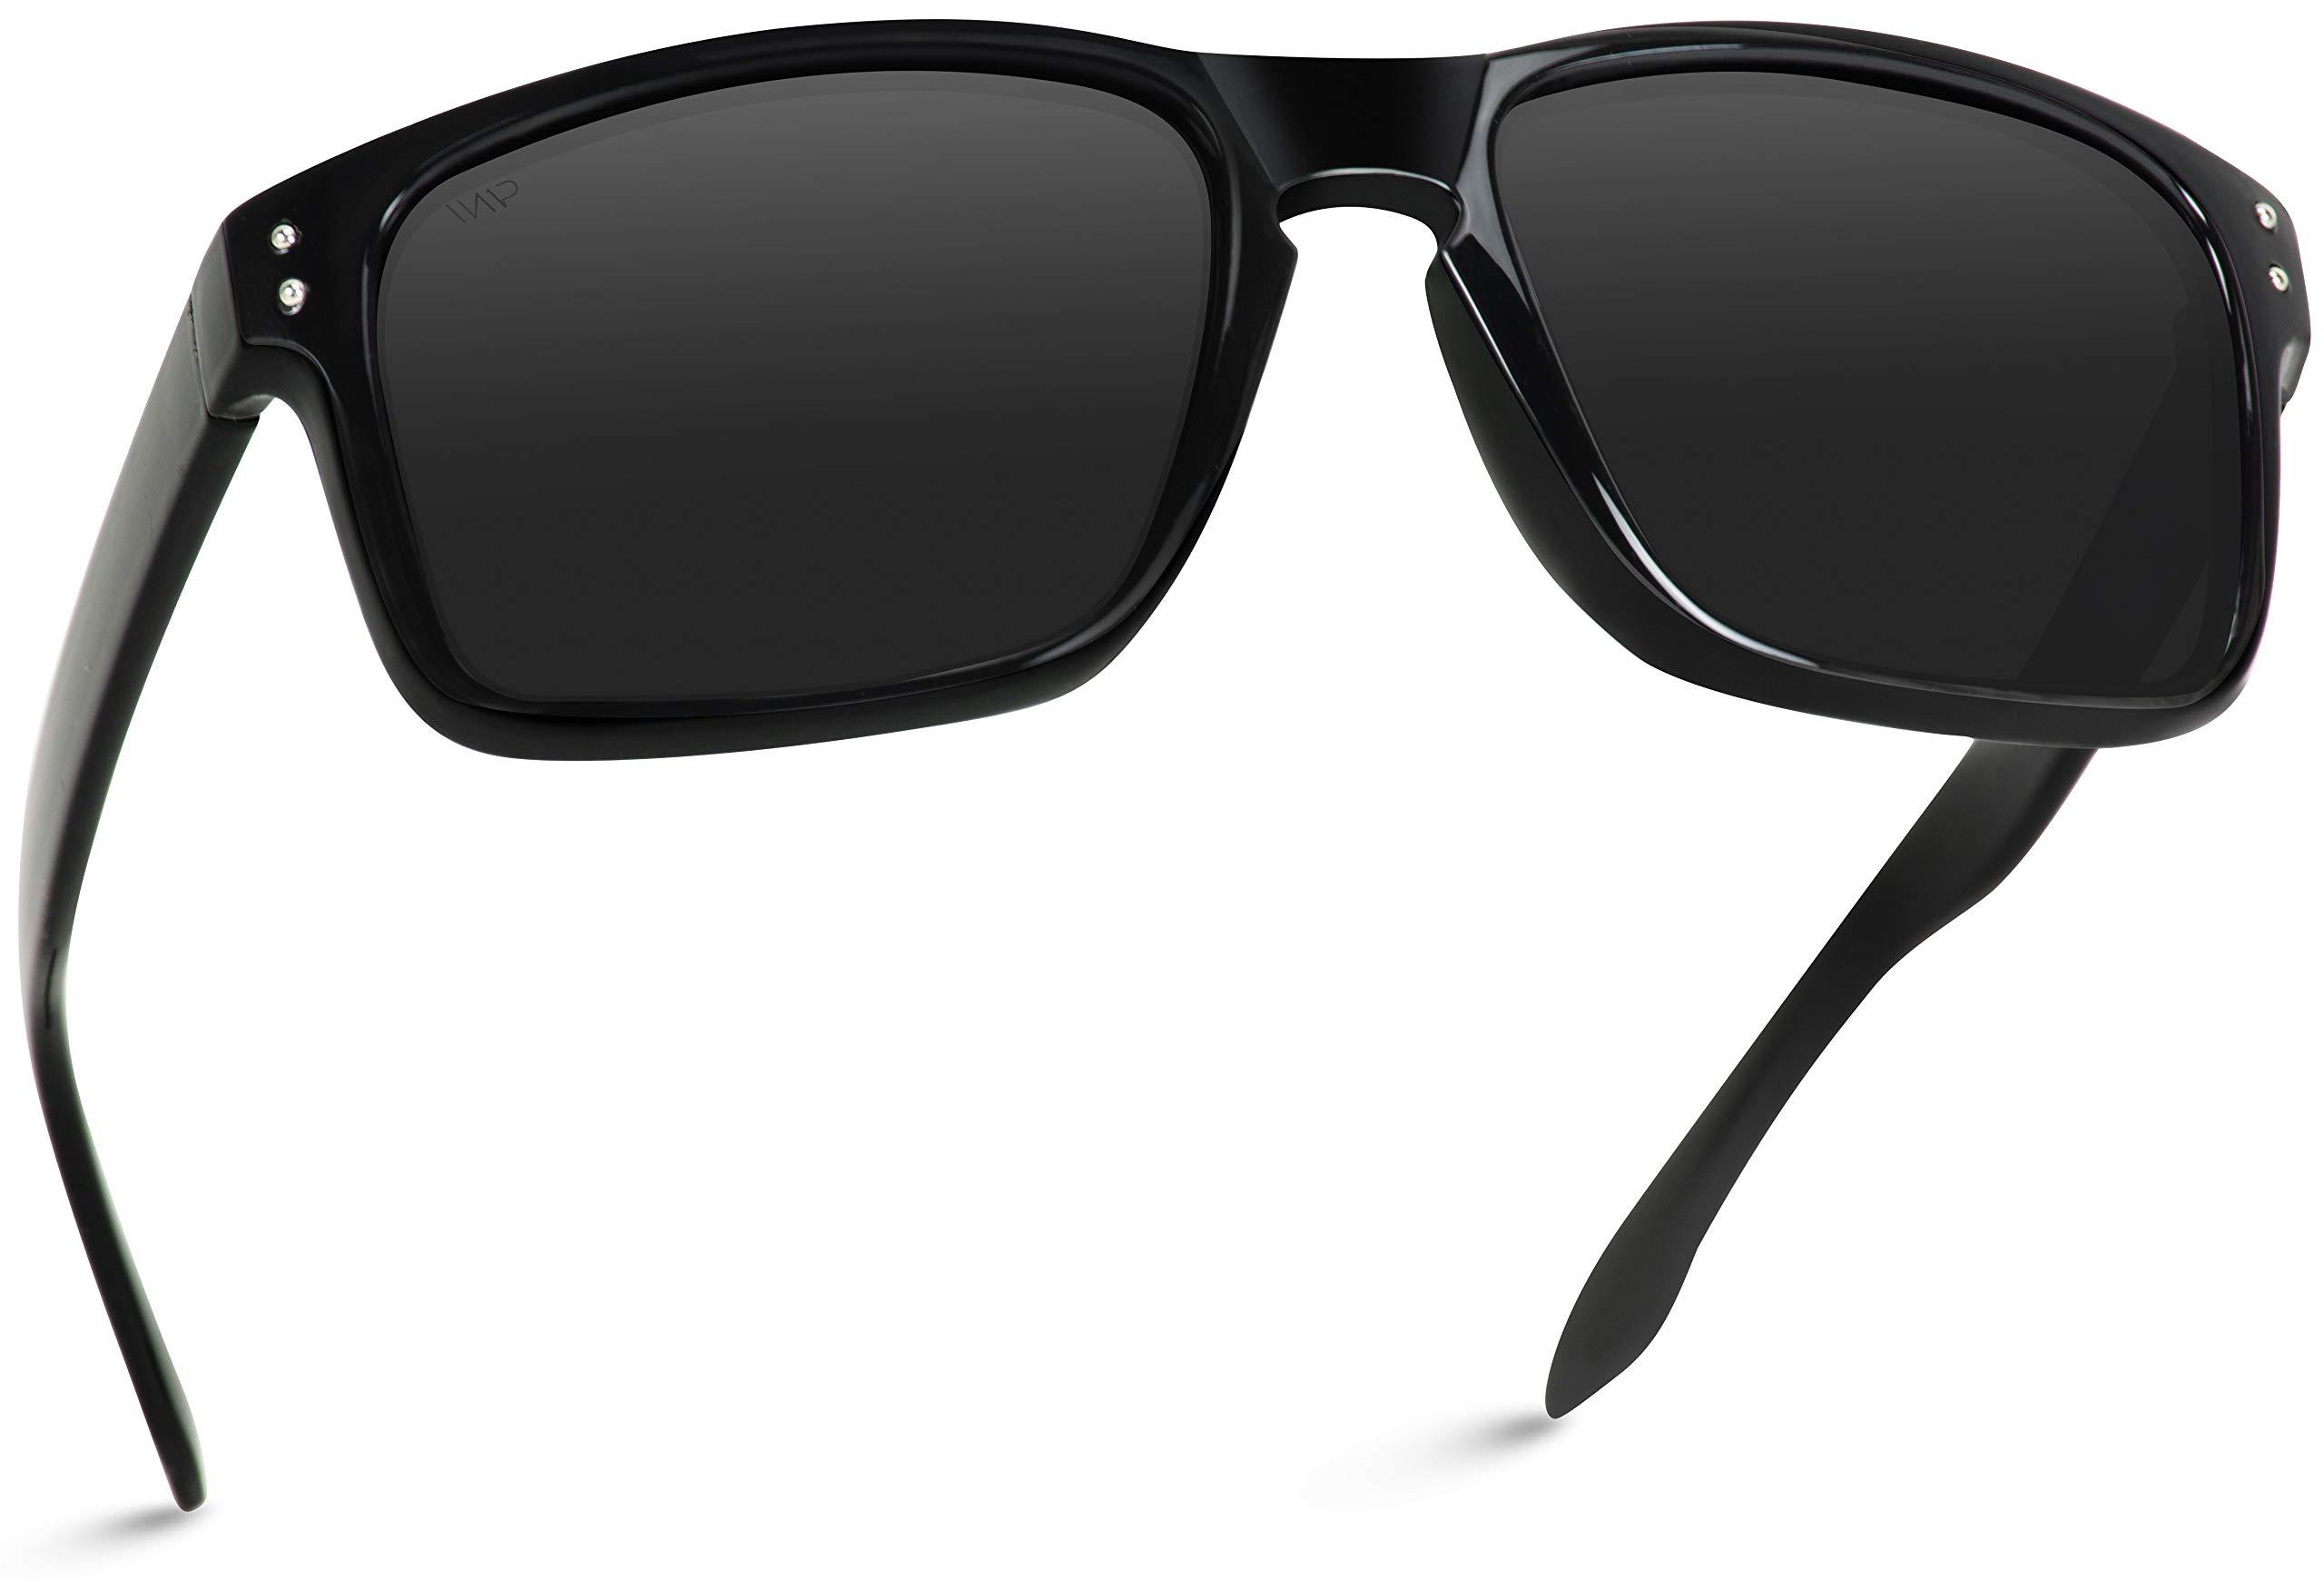 WearMe Pro - Premium Polarized Mirror Lens Classic Style Sunglasses (Black, 53) by WearMe Pro